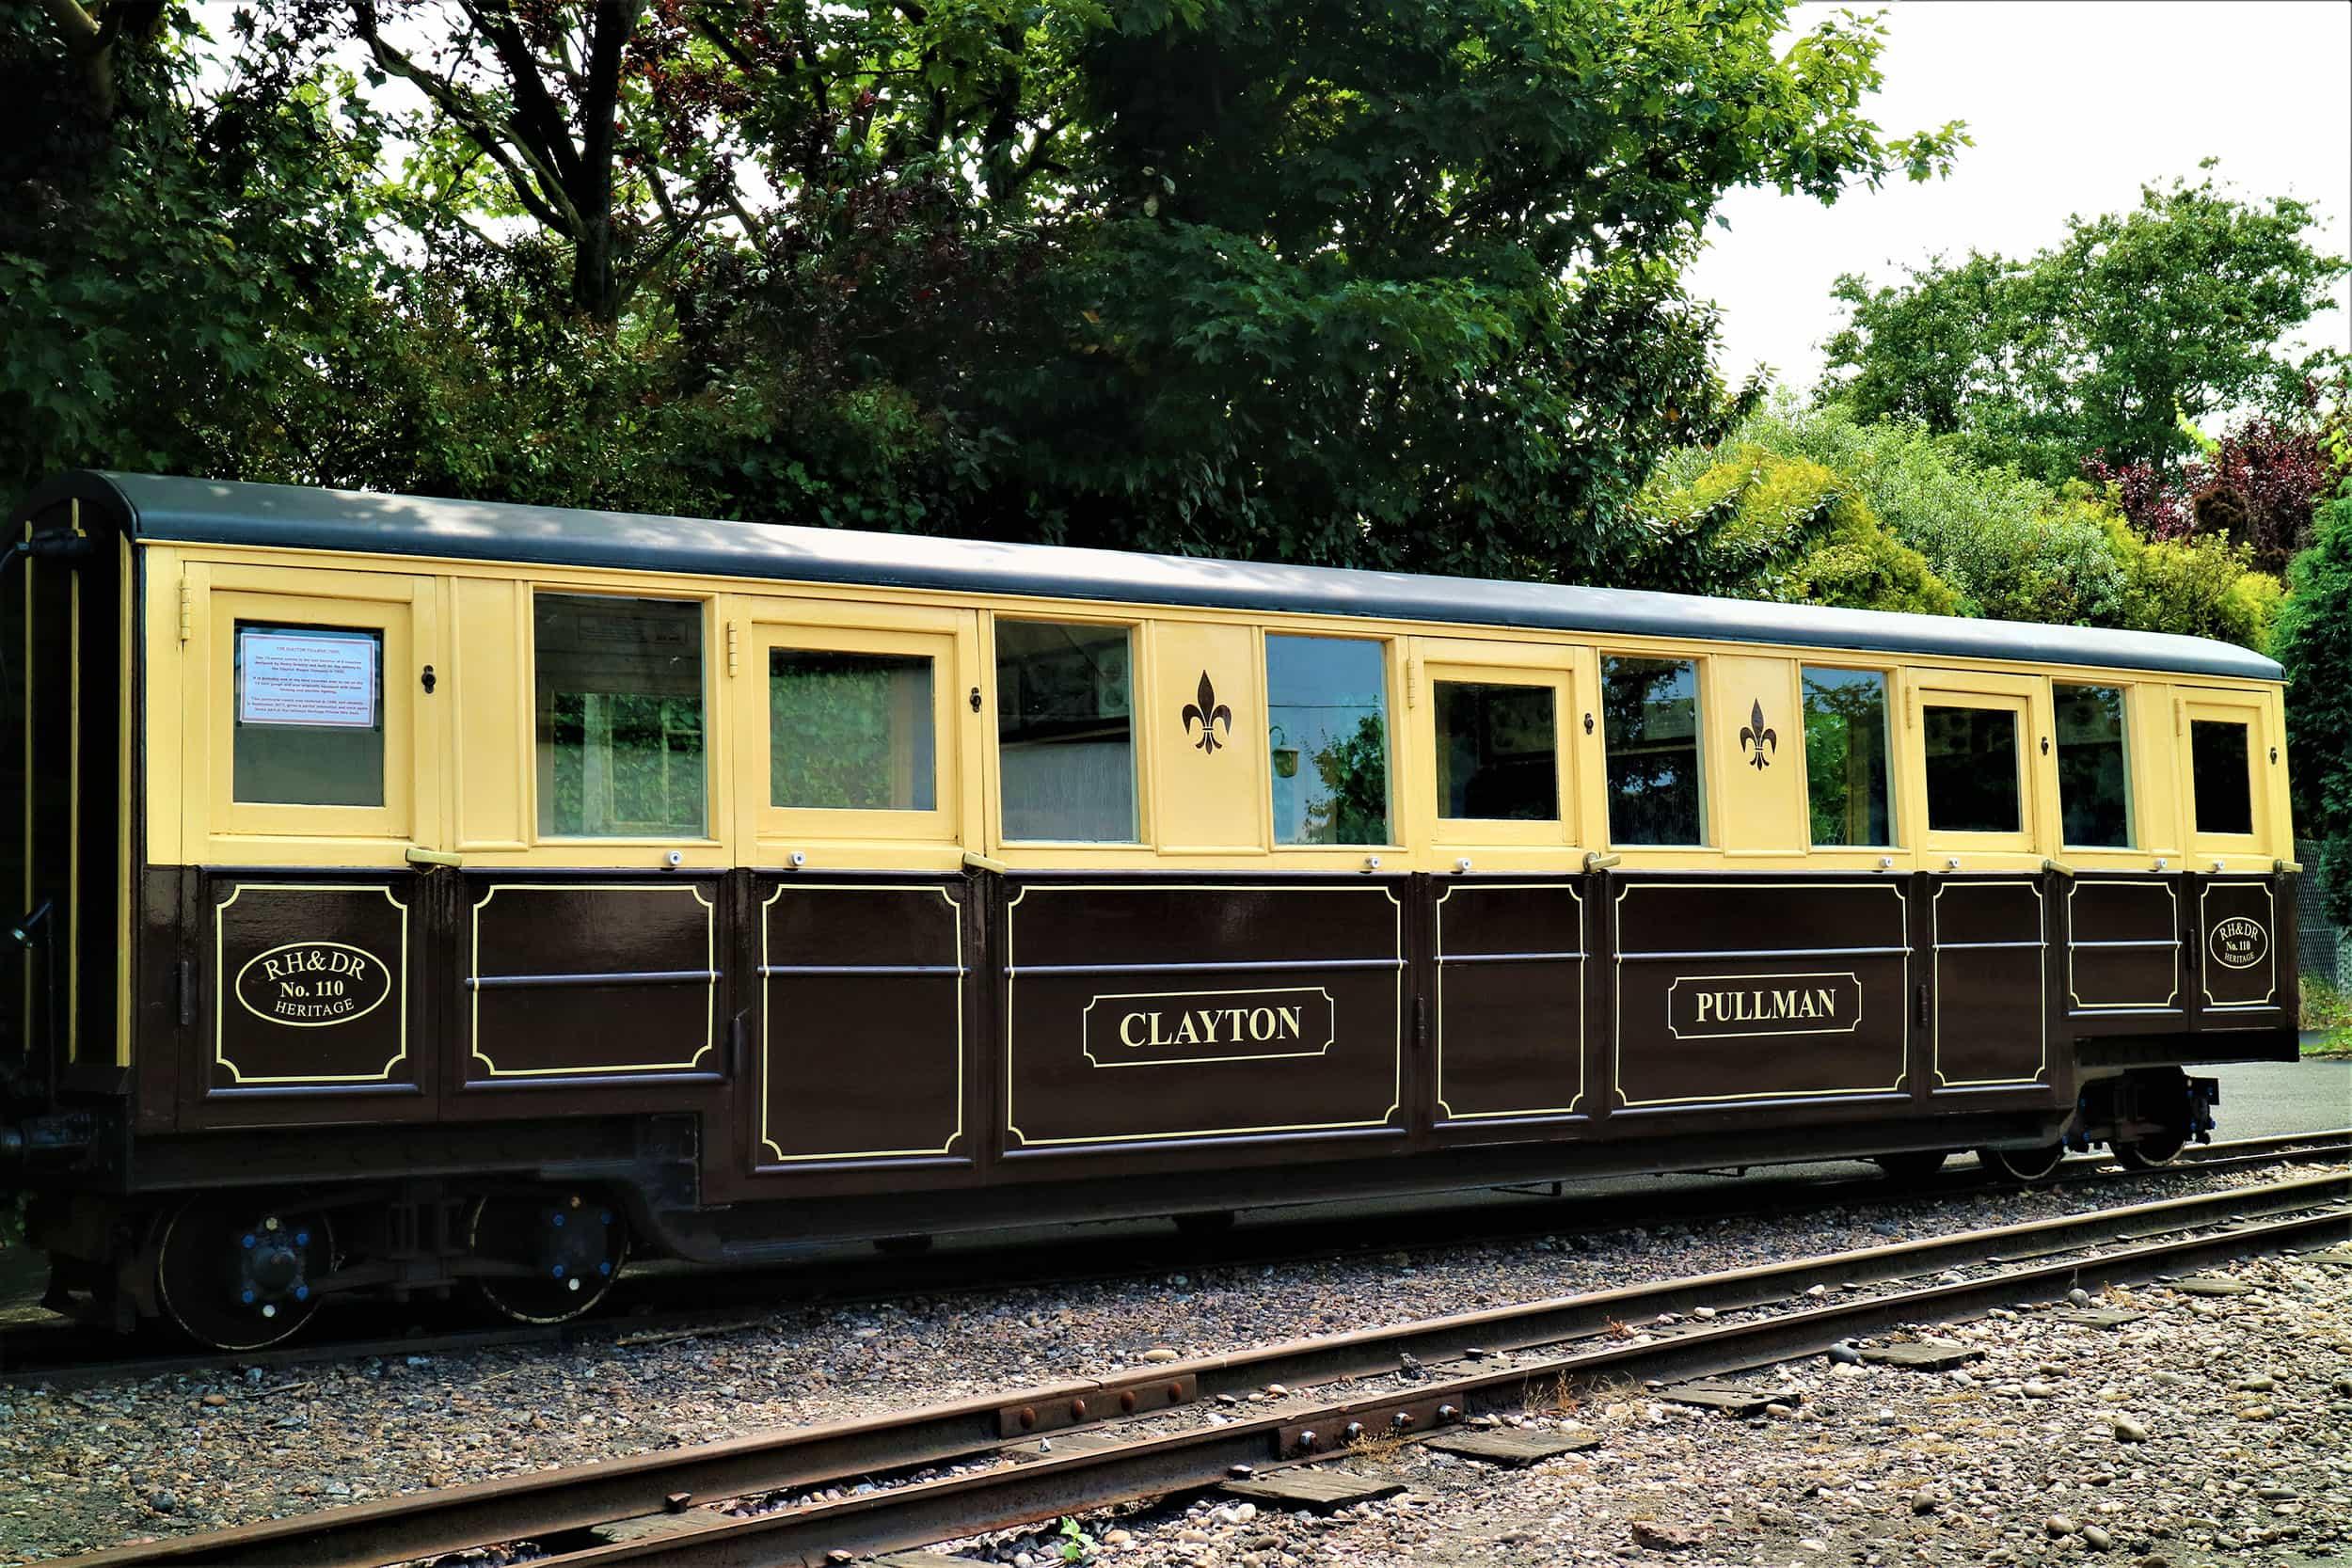 Heritage Carriage - Clayton Pullman - Romney, Hythe & Dymchurch Railway